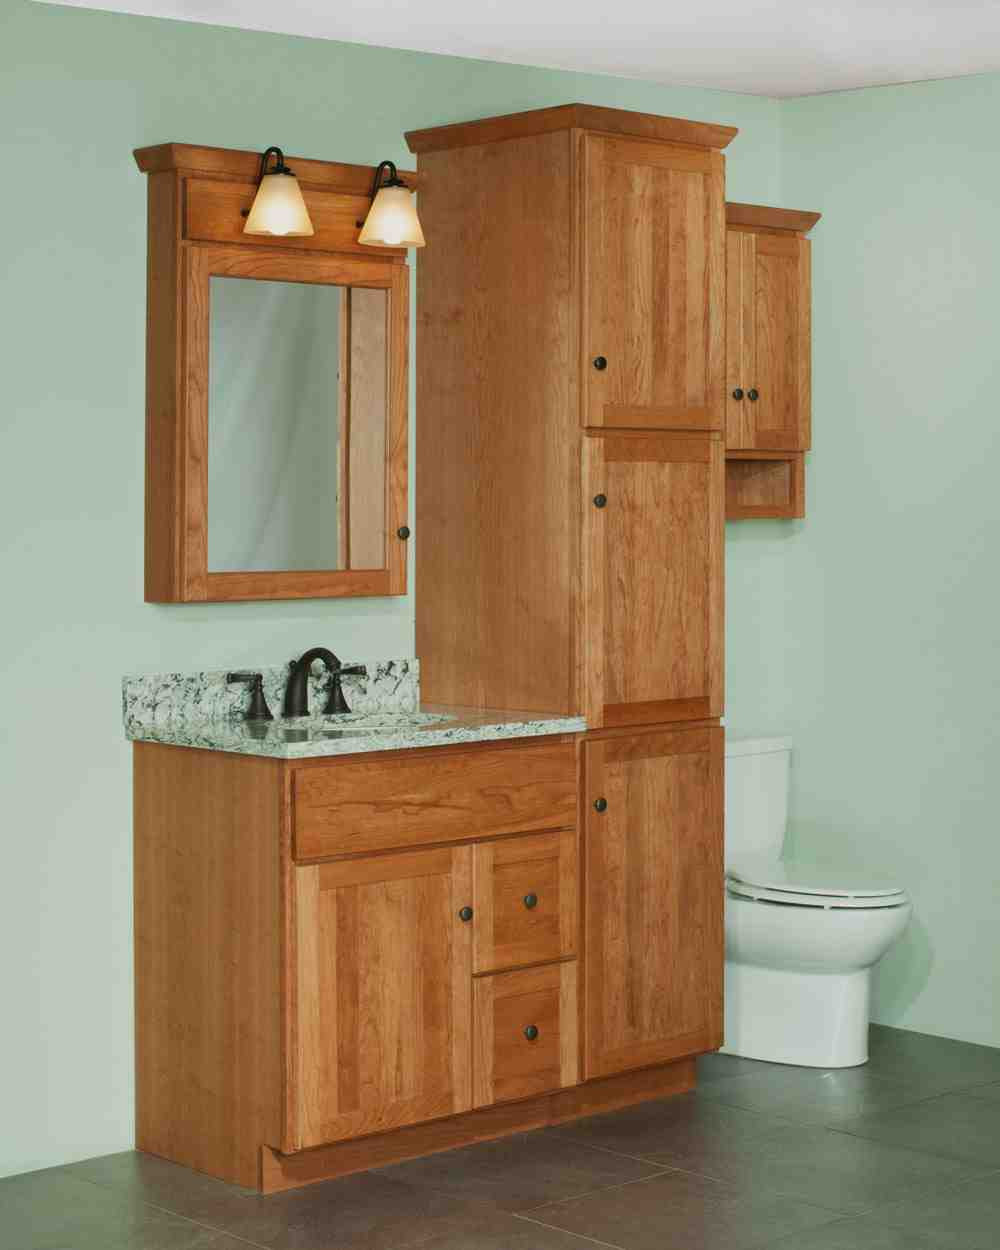 Bathroom Vanity With Linen Cabinet  Bathroom Vanity and Linen Cabinet Sets Home Furniture Design